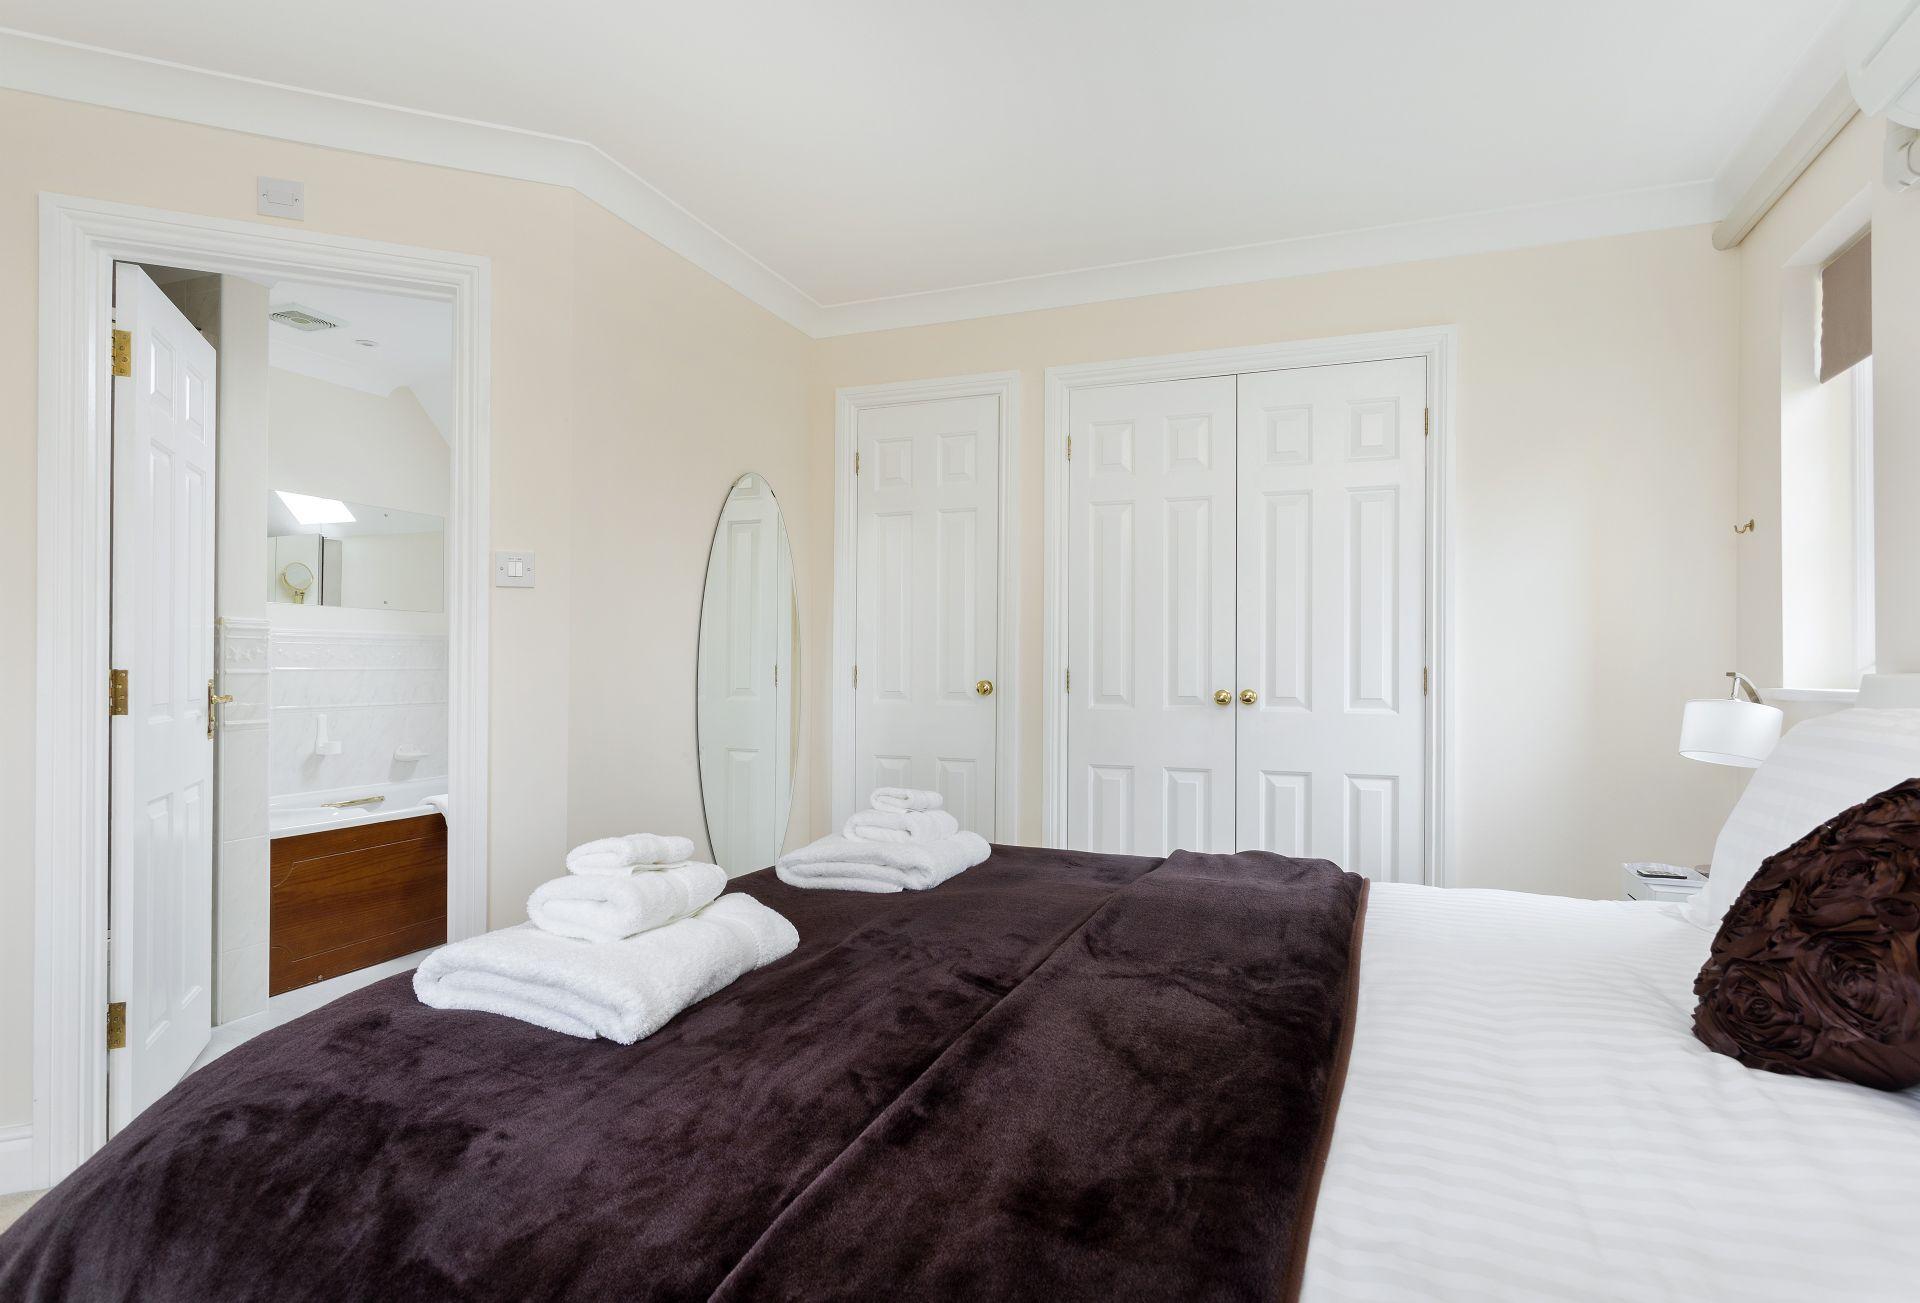 First floor: En-suite bathroom leads off from the master bedroom